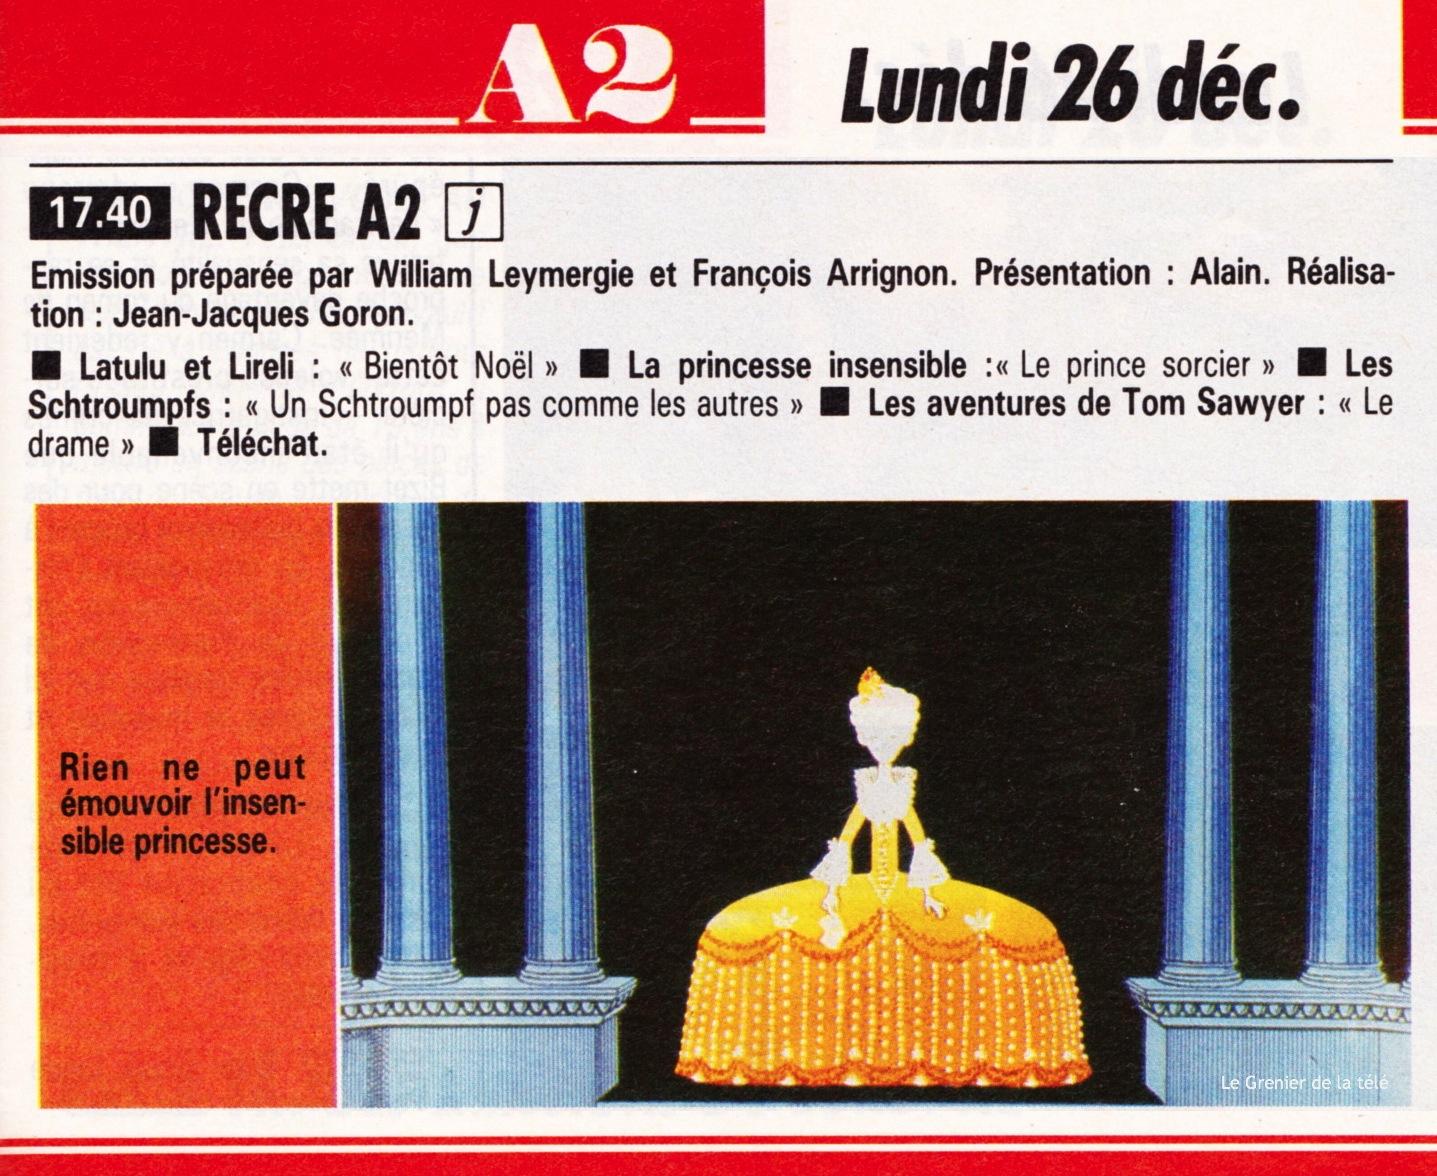 http://grenierdelatv.free.fr/recrea226decembre1983.jpg